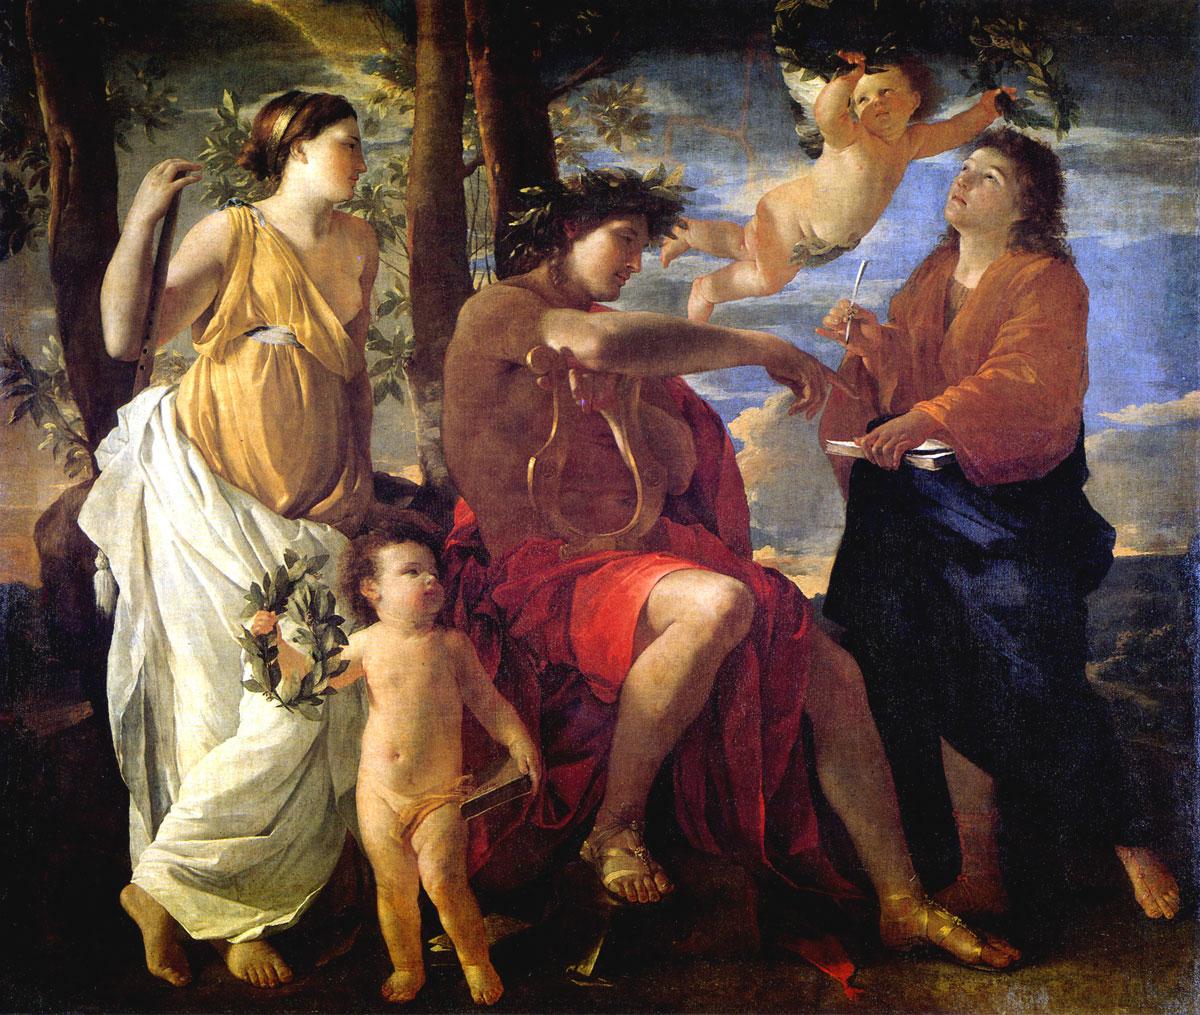 Ispirazione del poeta - Poussin - Inspiration of the poet